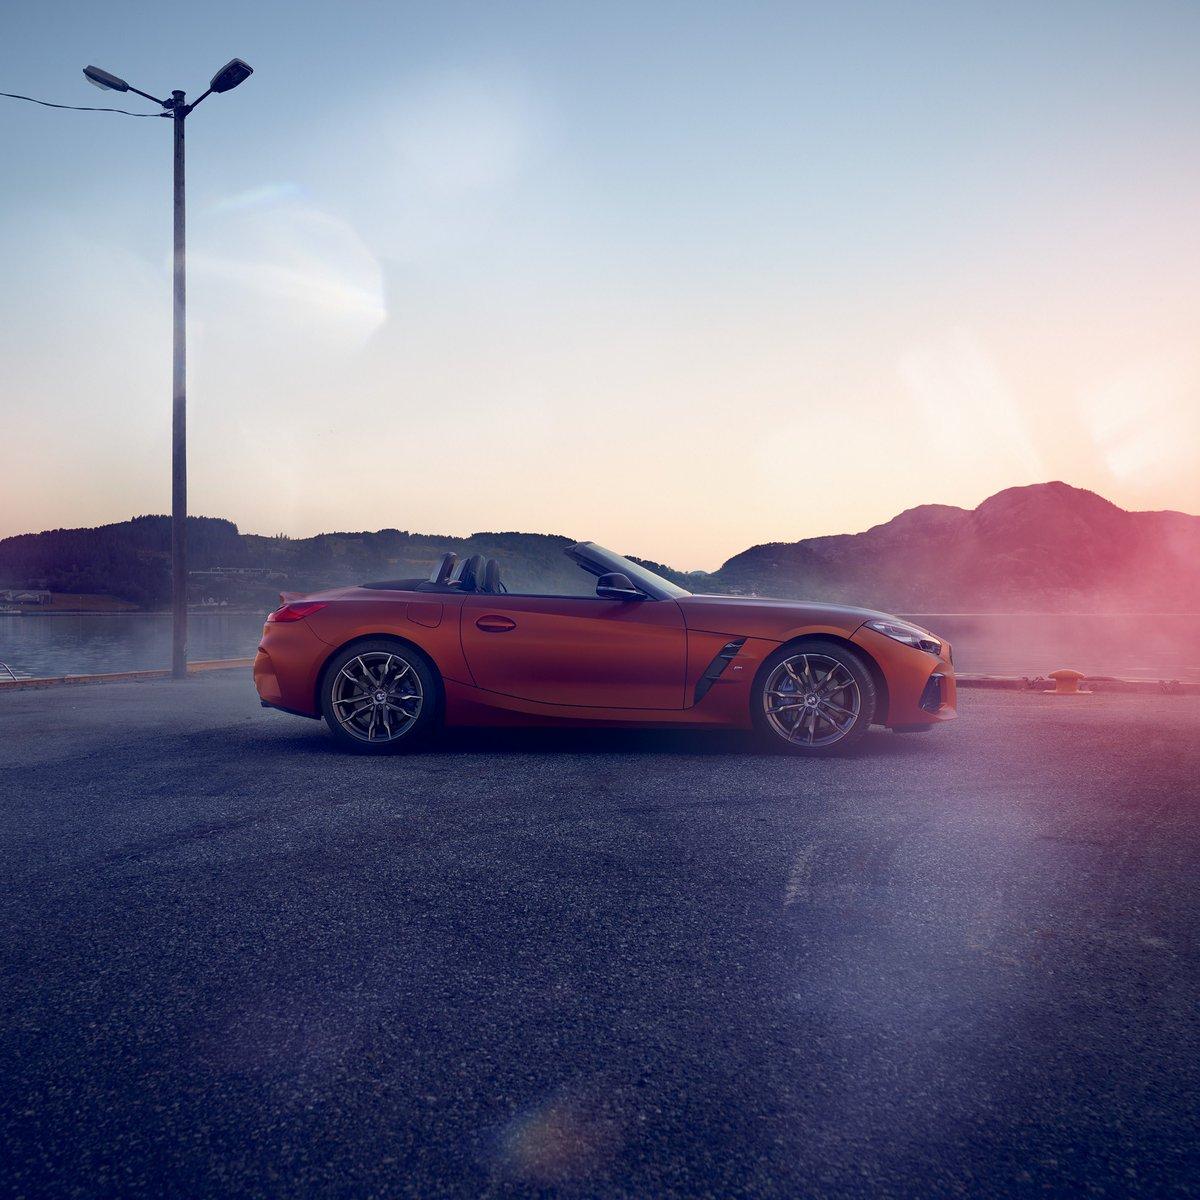 BMW UK on Twitter: